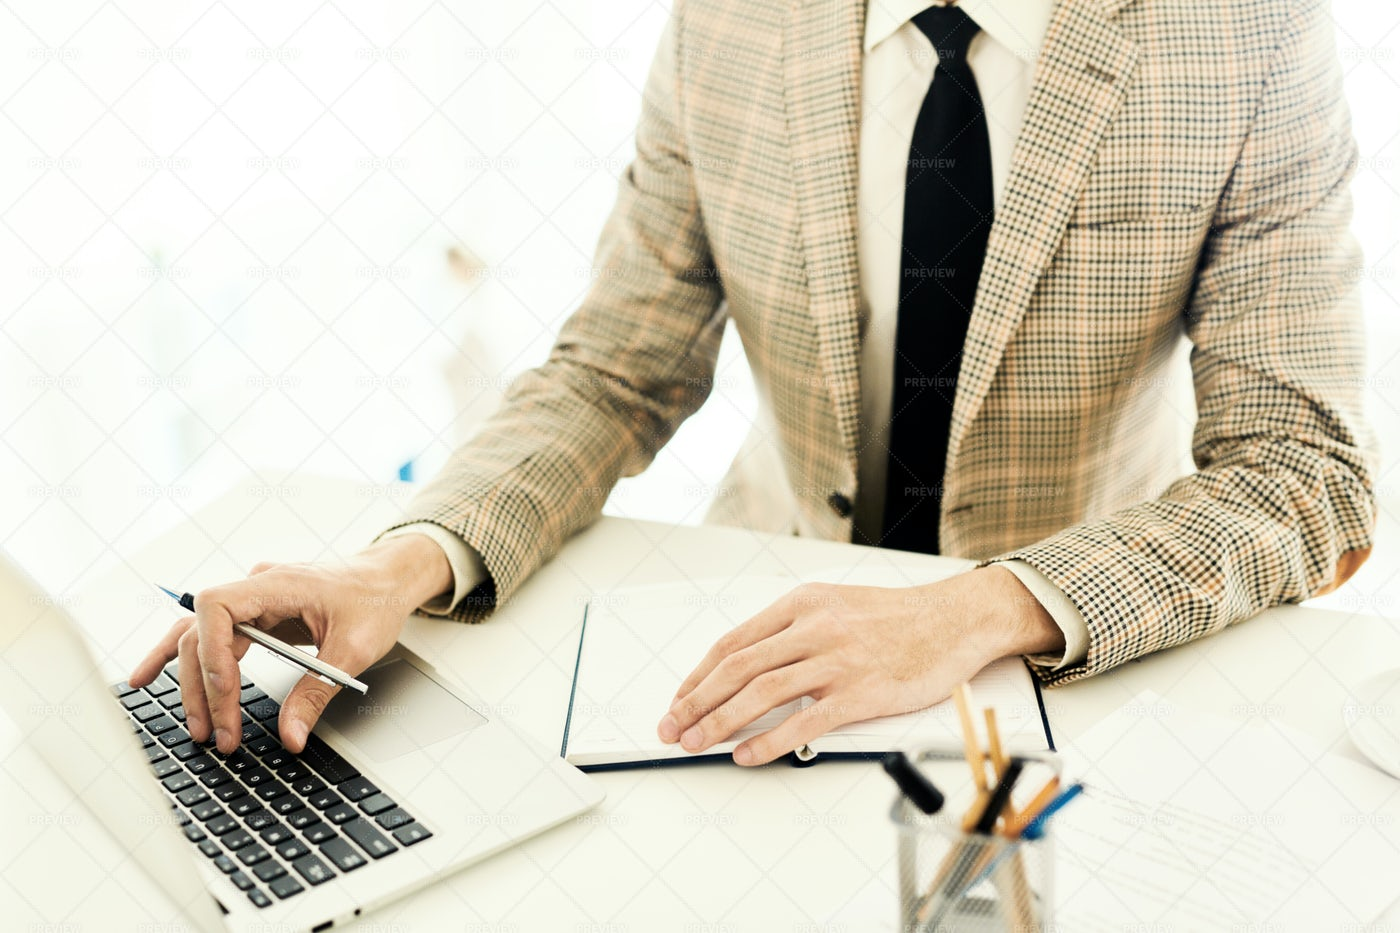 Analyzing Online Data: Stock Photos